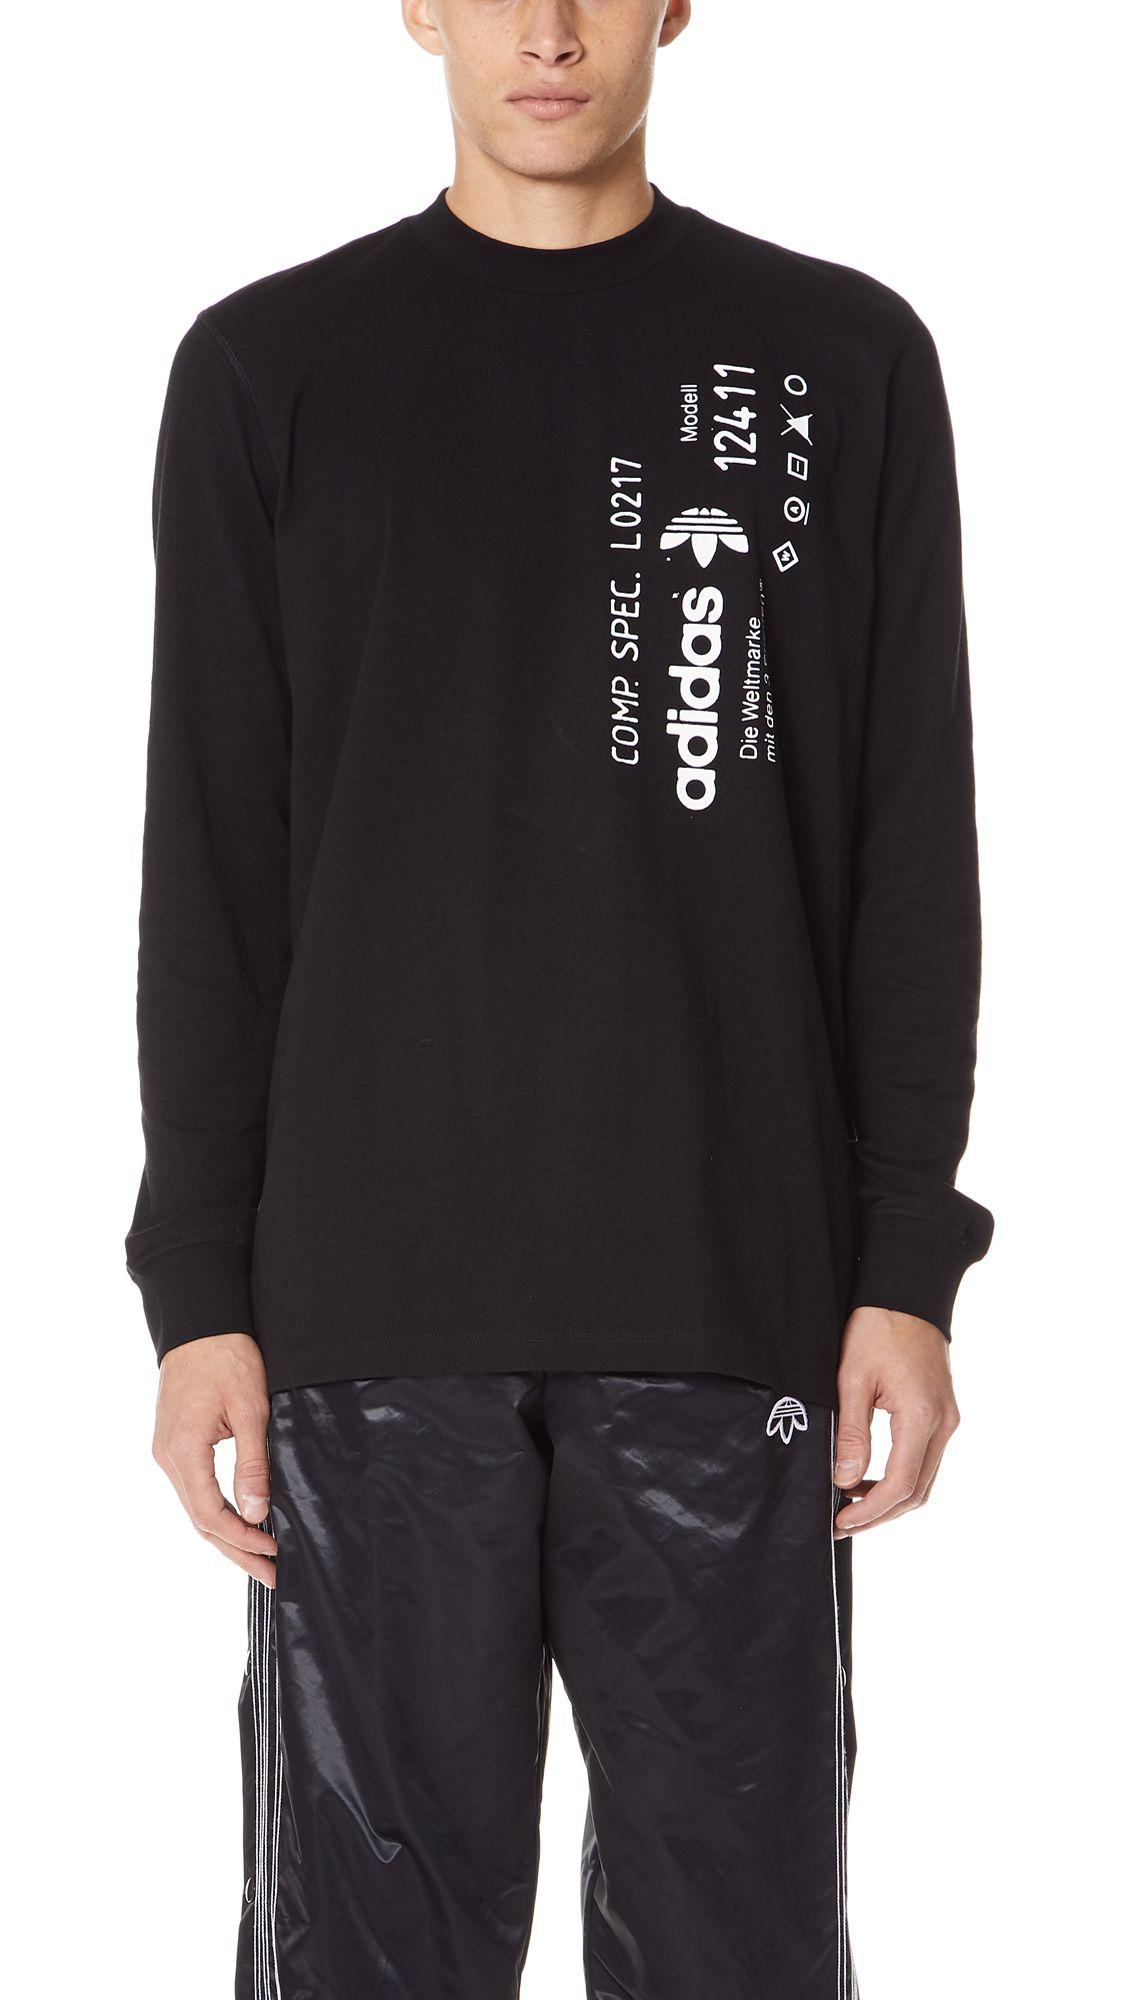 9bb70dba41aa ADIDAS ORIGINALS BY ALEXANDER WANG AW GRAPHIC LONG SLEEVE TEE.  #adidasoriginalsbyalexanderwang #cloth #